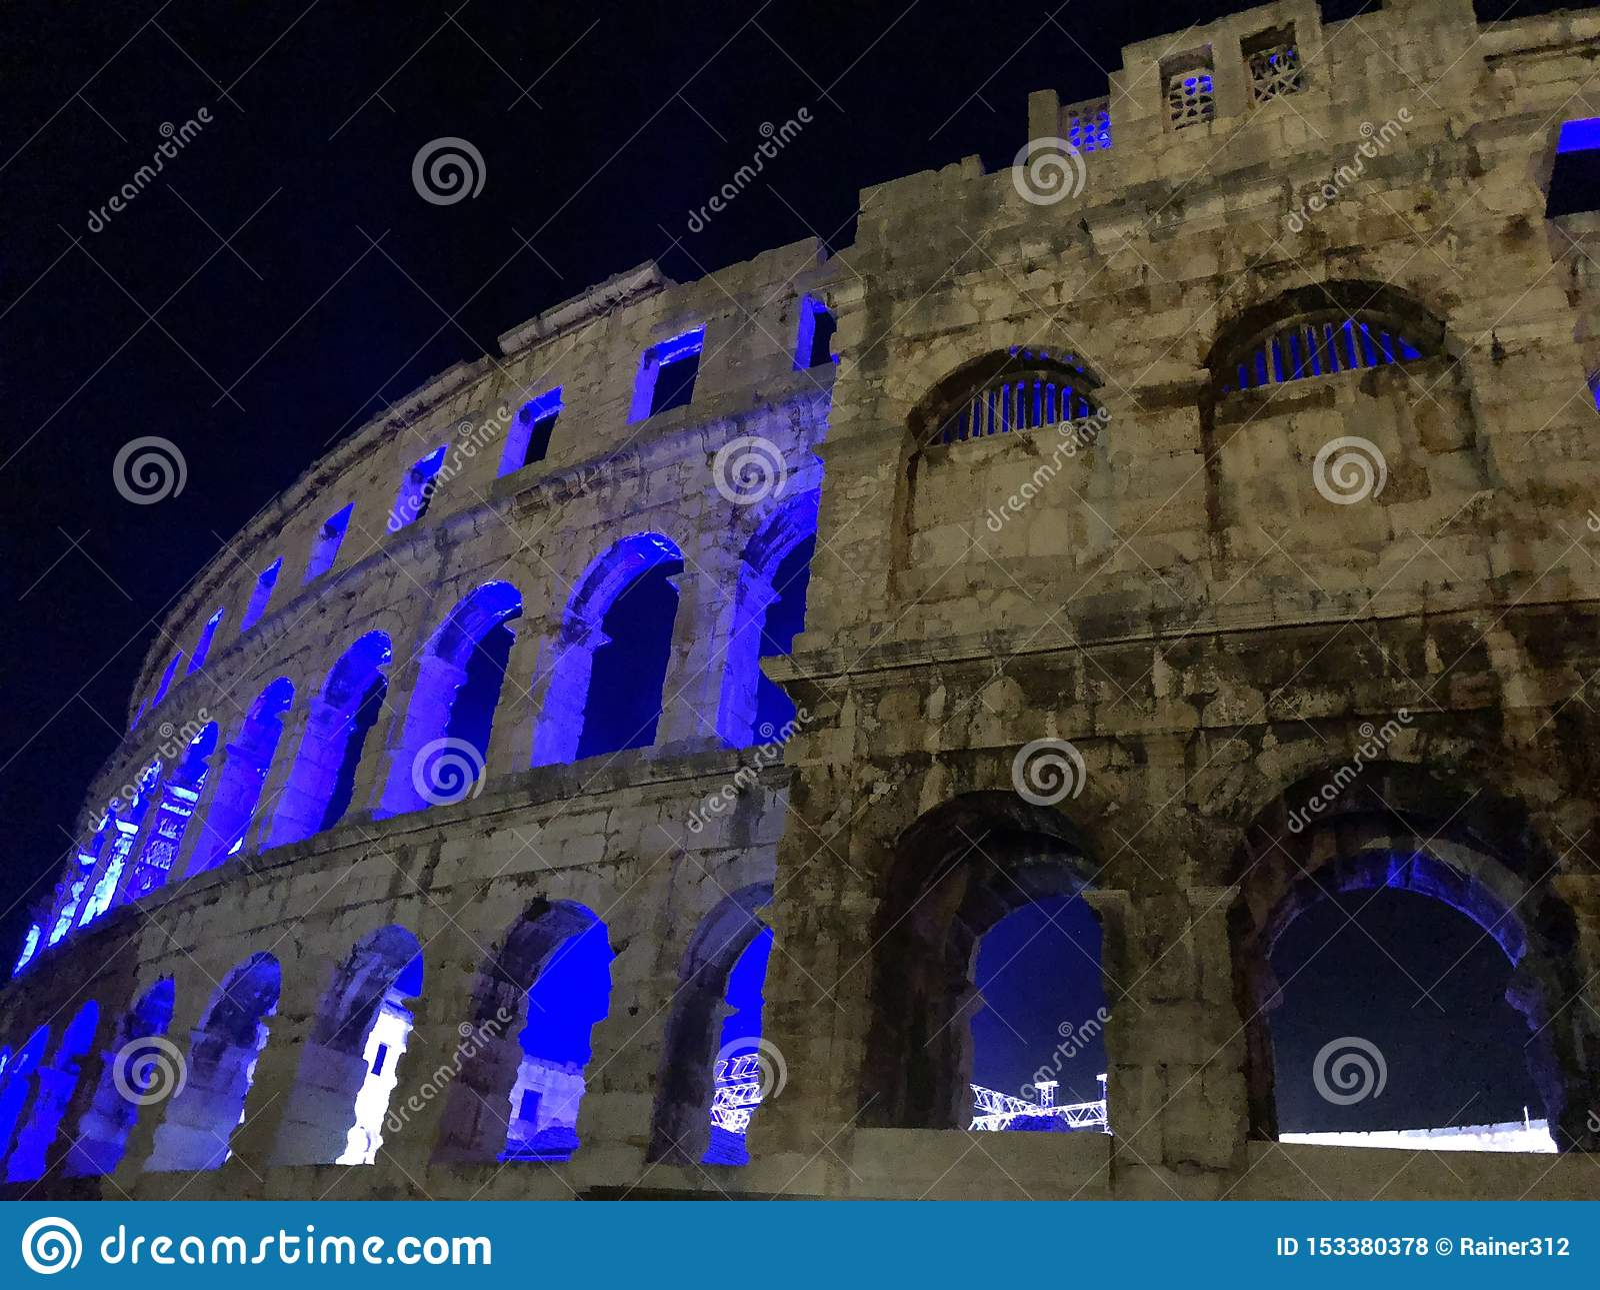 Iluminująca amphitheatre ruina w Pula, Chorwacja/